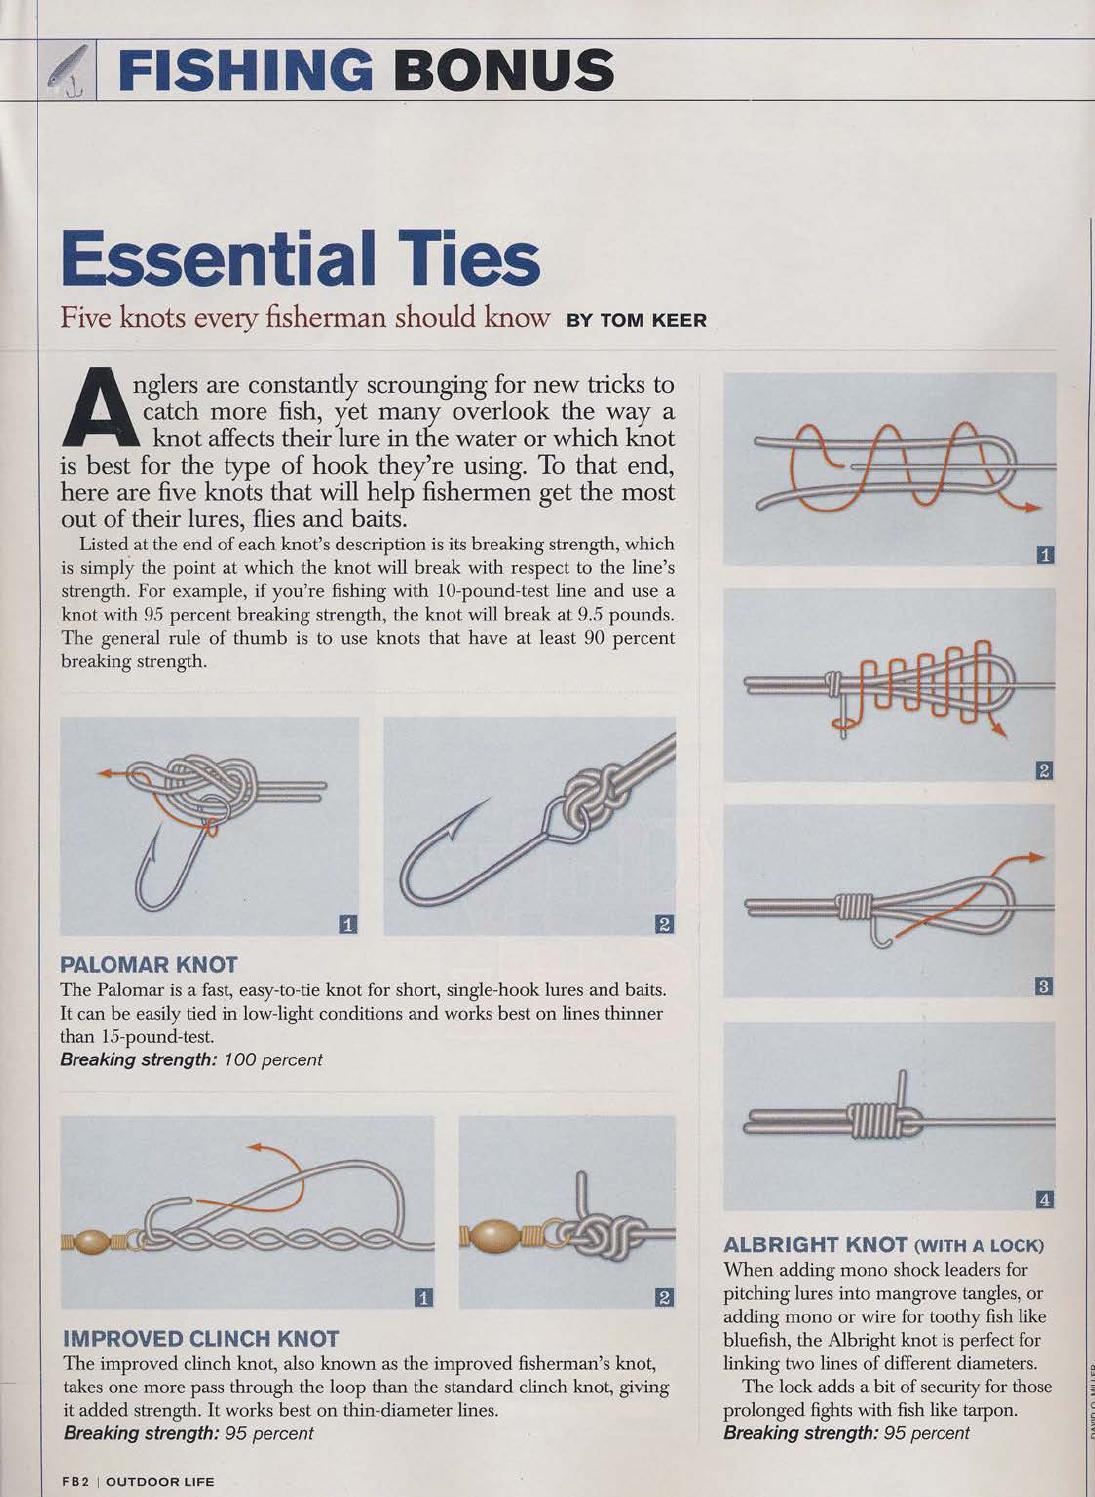 Essential Ties By Tom Keer Originally Printed In Outdoor Life Adding A New Light Loop Wiring Issuu